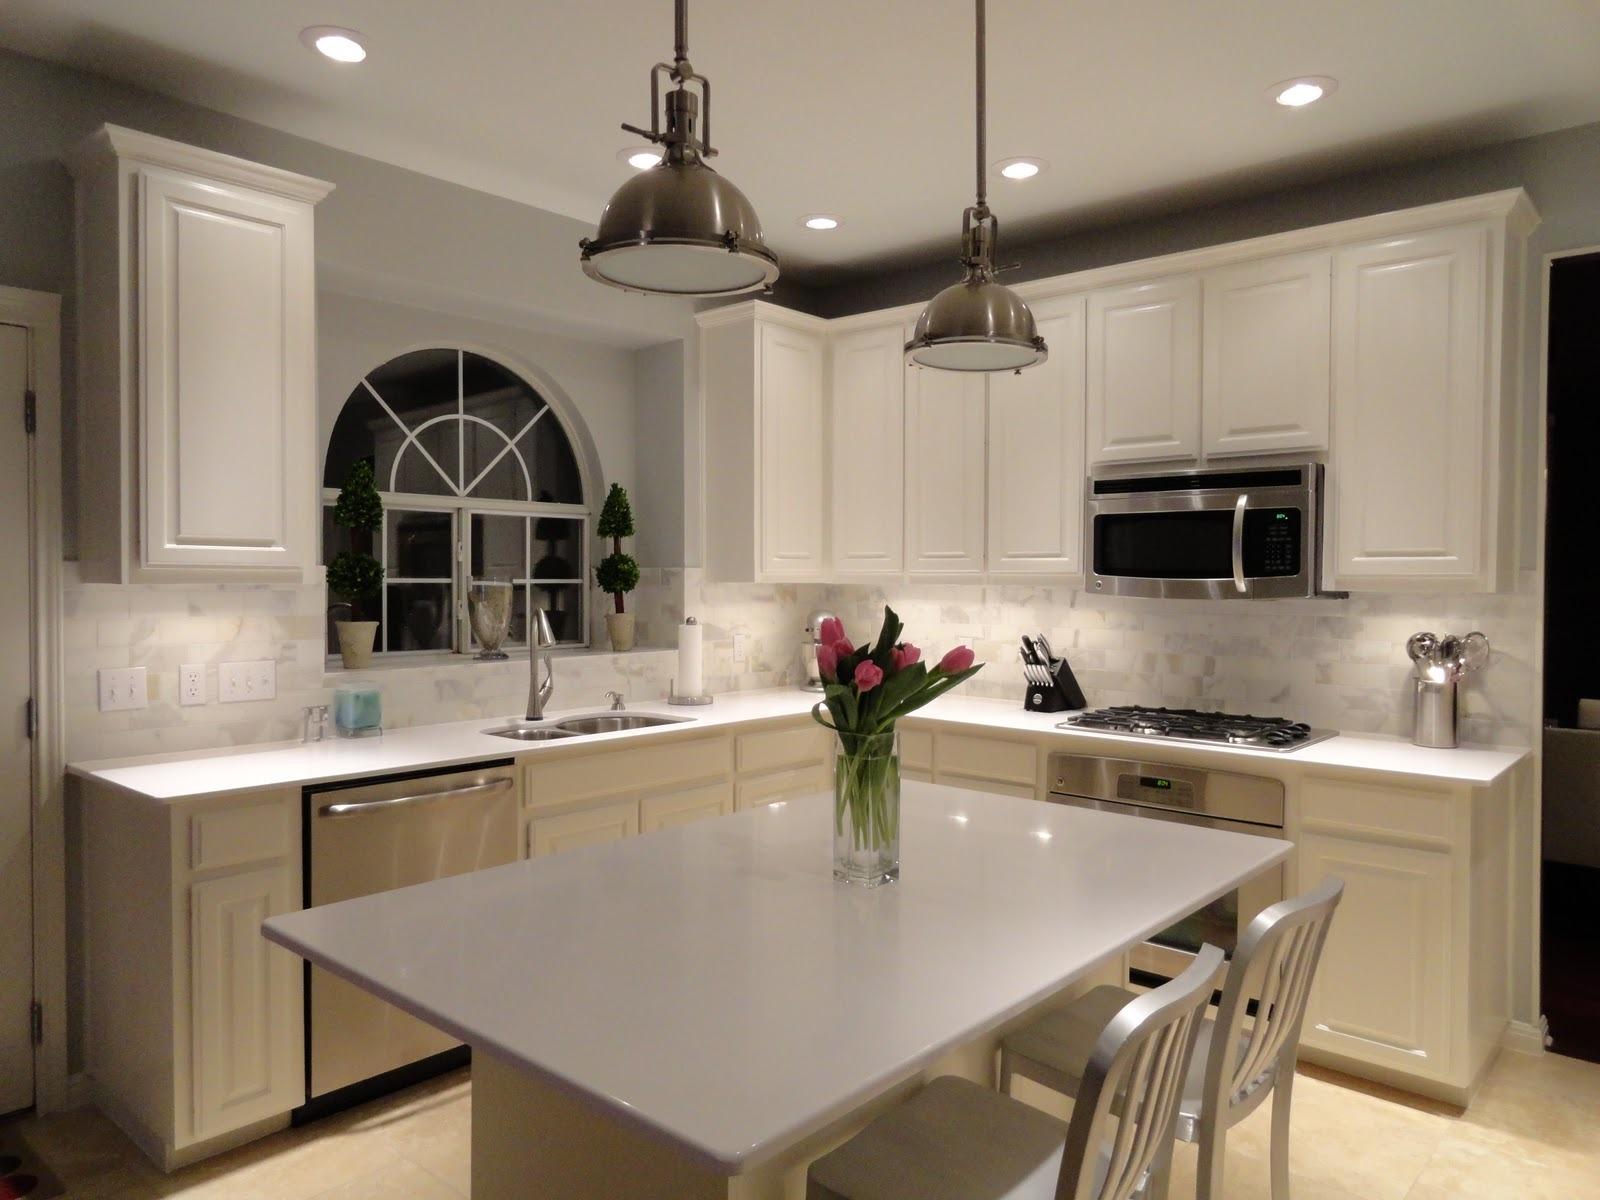 China Artificial Quartz Countertop for Kitchen quartz kitchen countertops Artificial Quartz Countertop for Kitchen